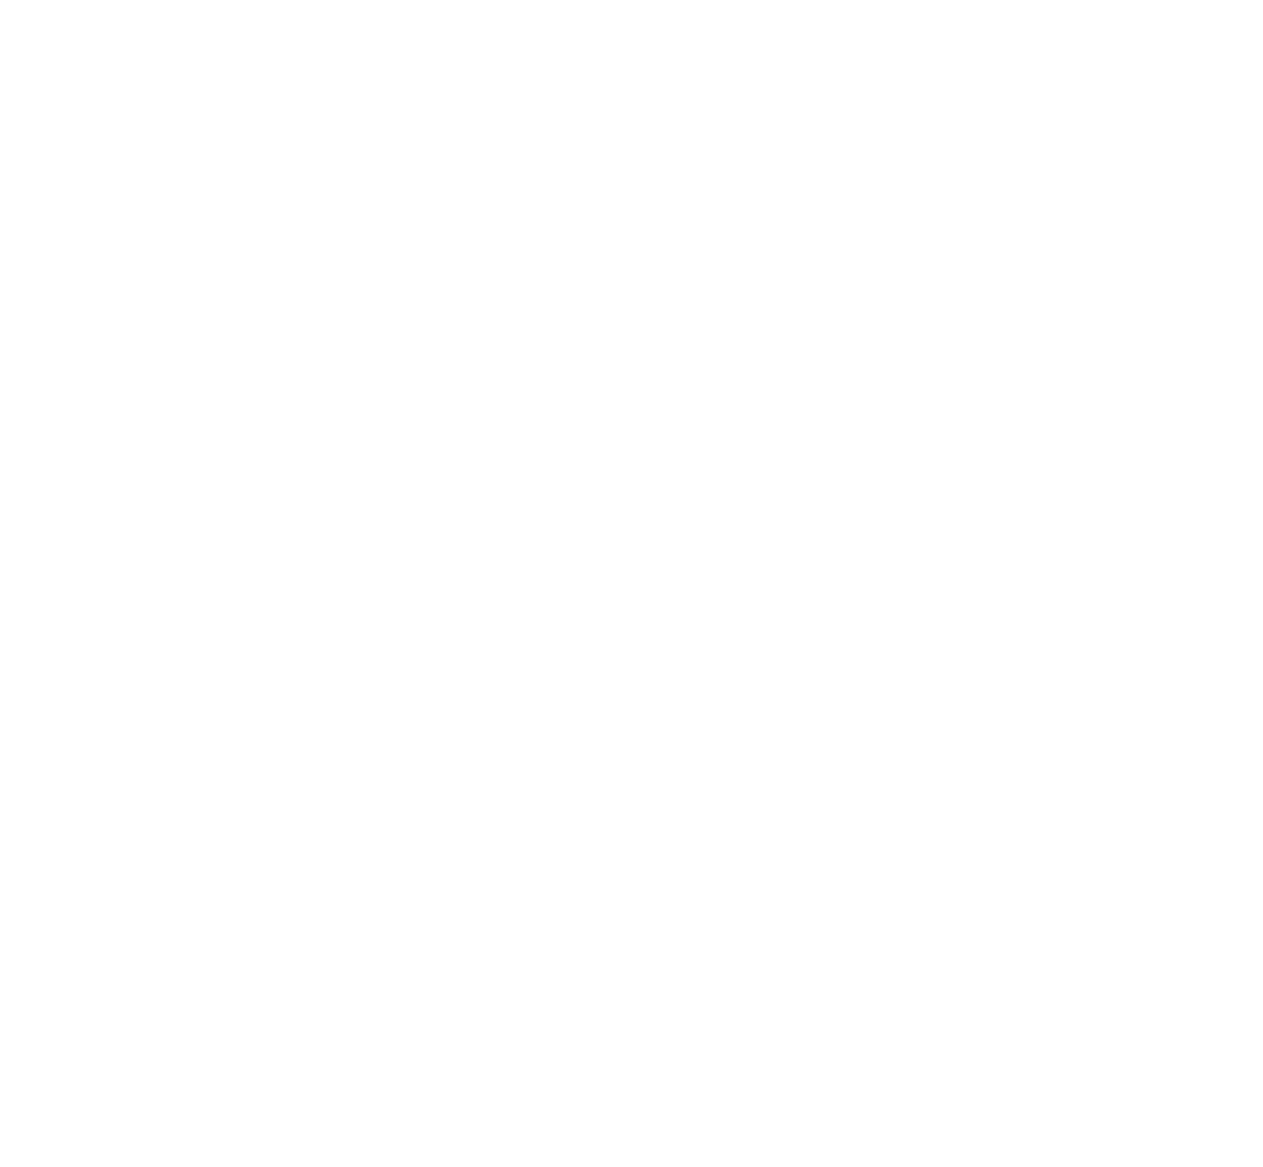 Camping Buchholz Logo